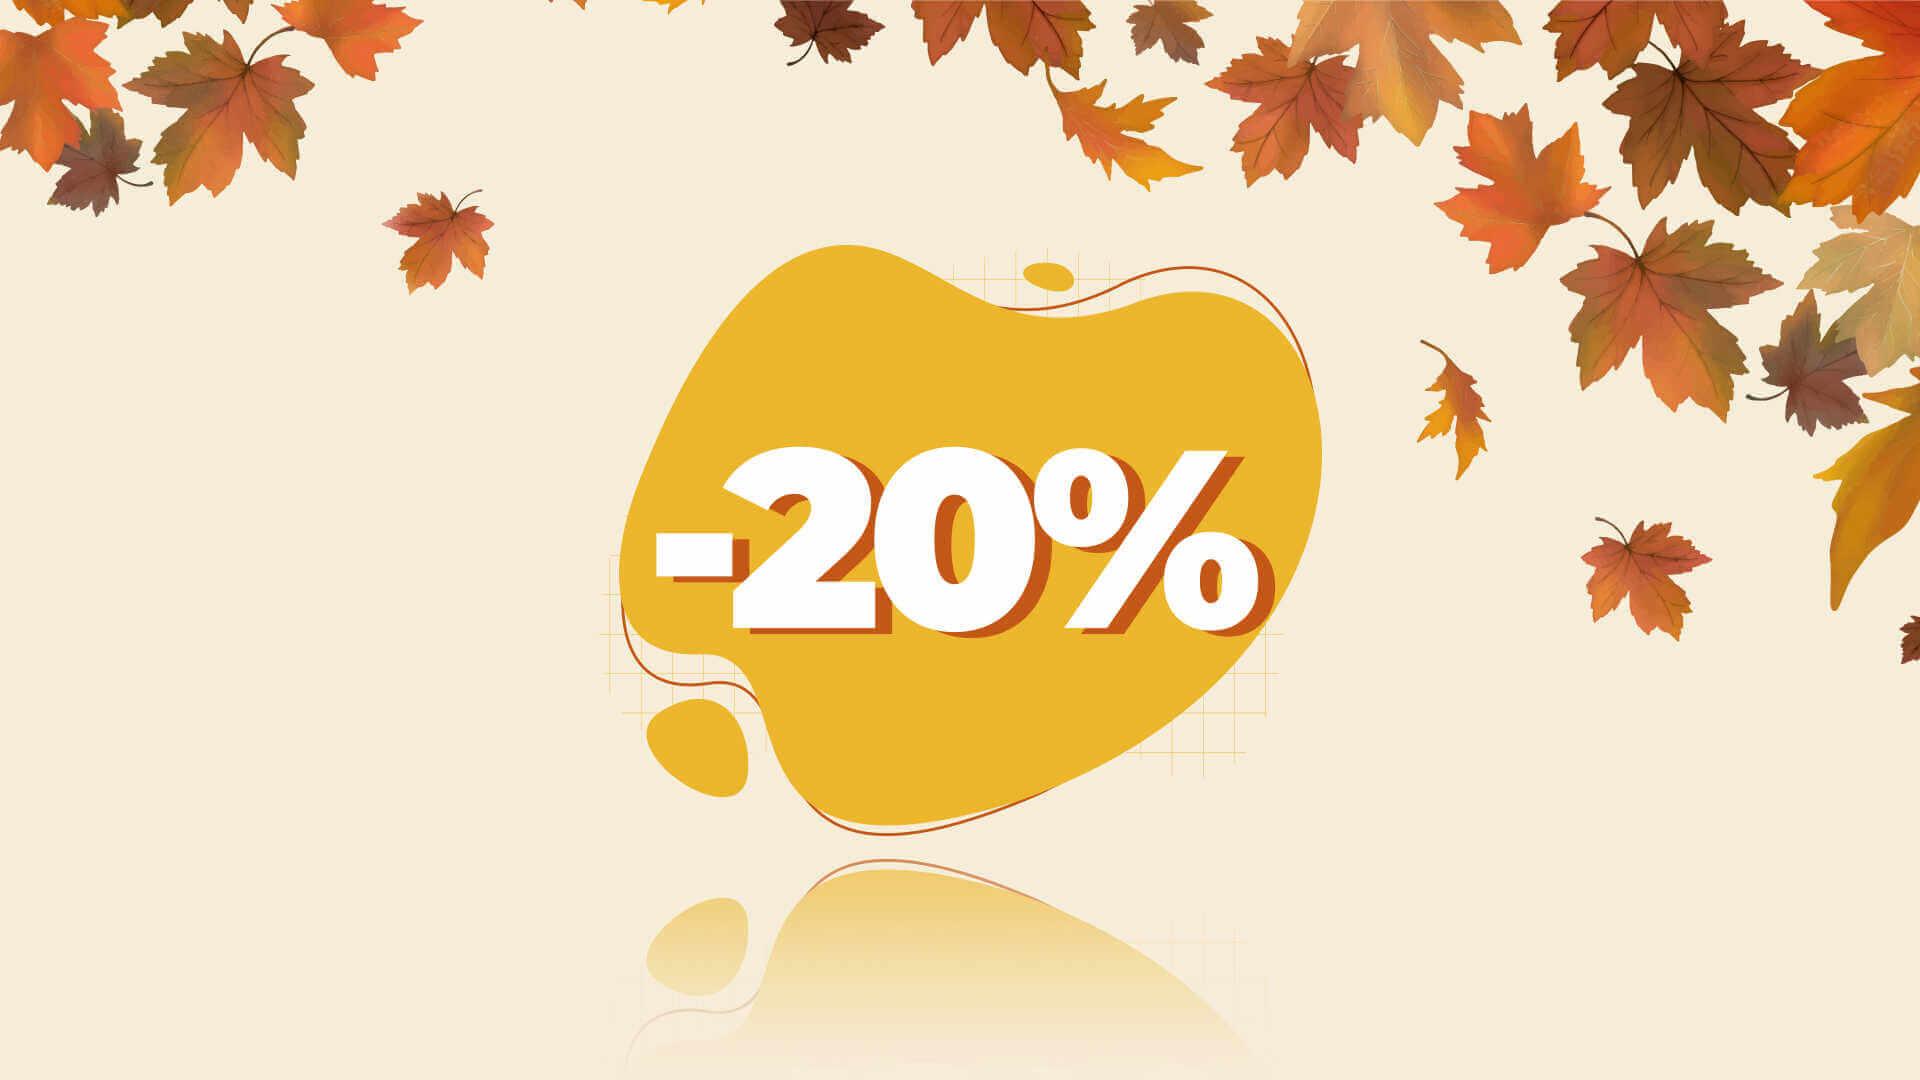 Toamna vine cu promotii - 20%